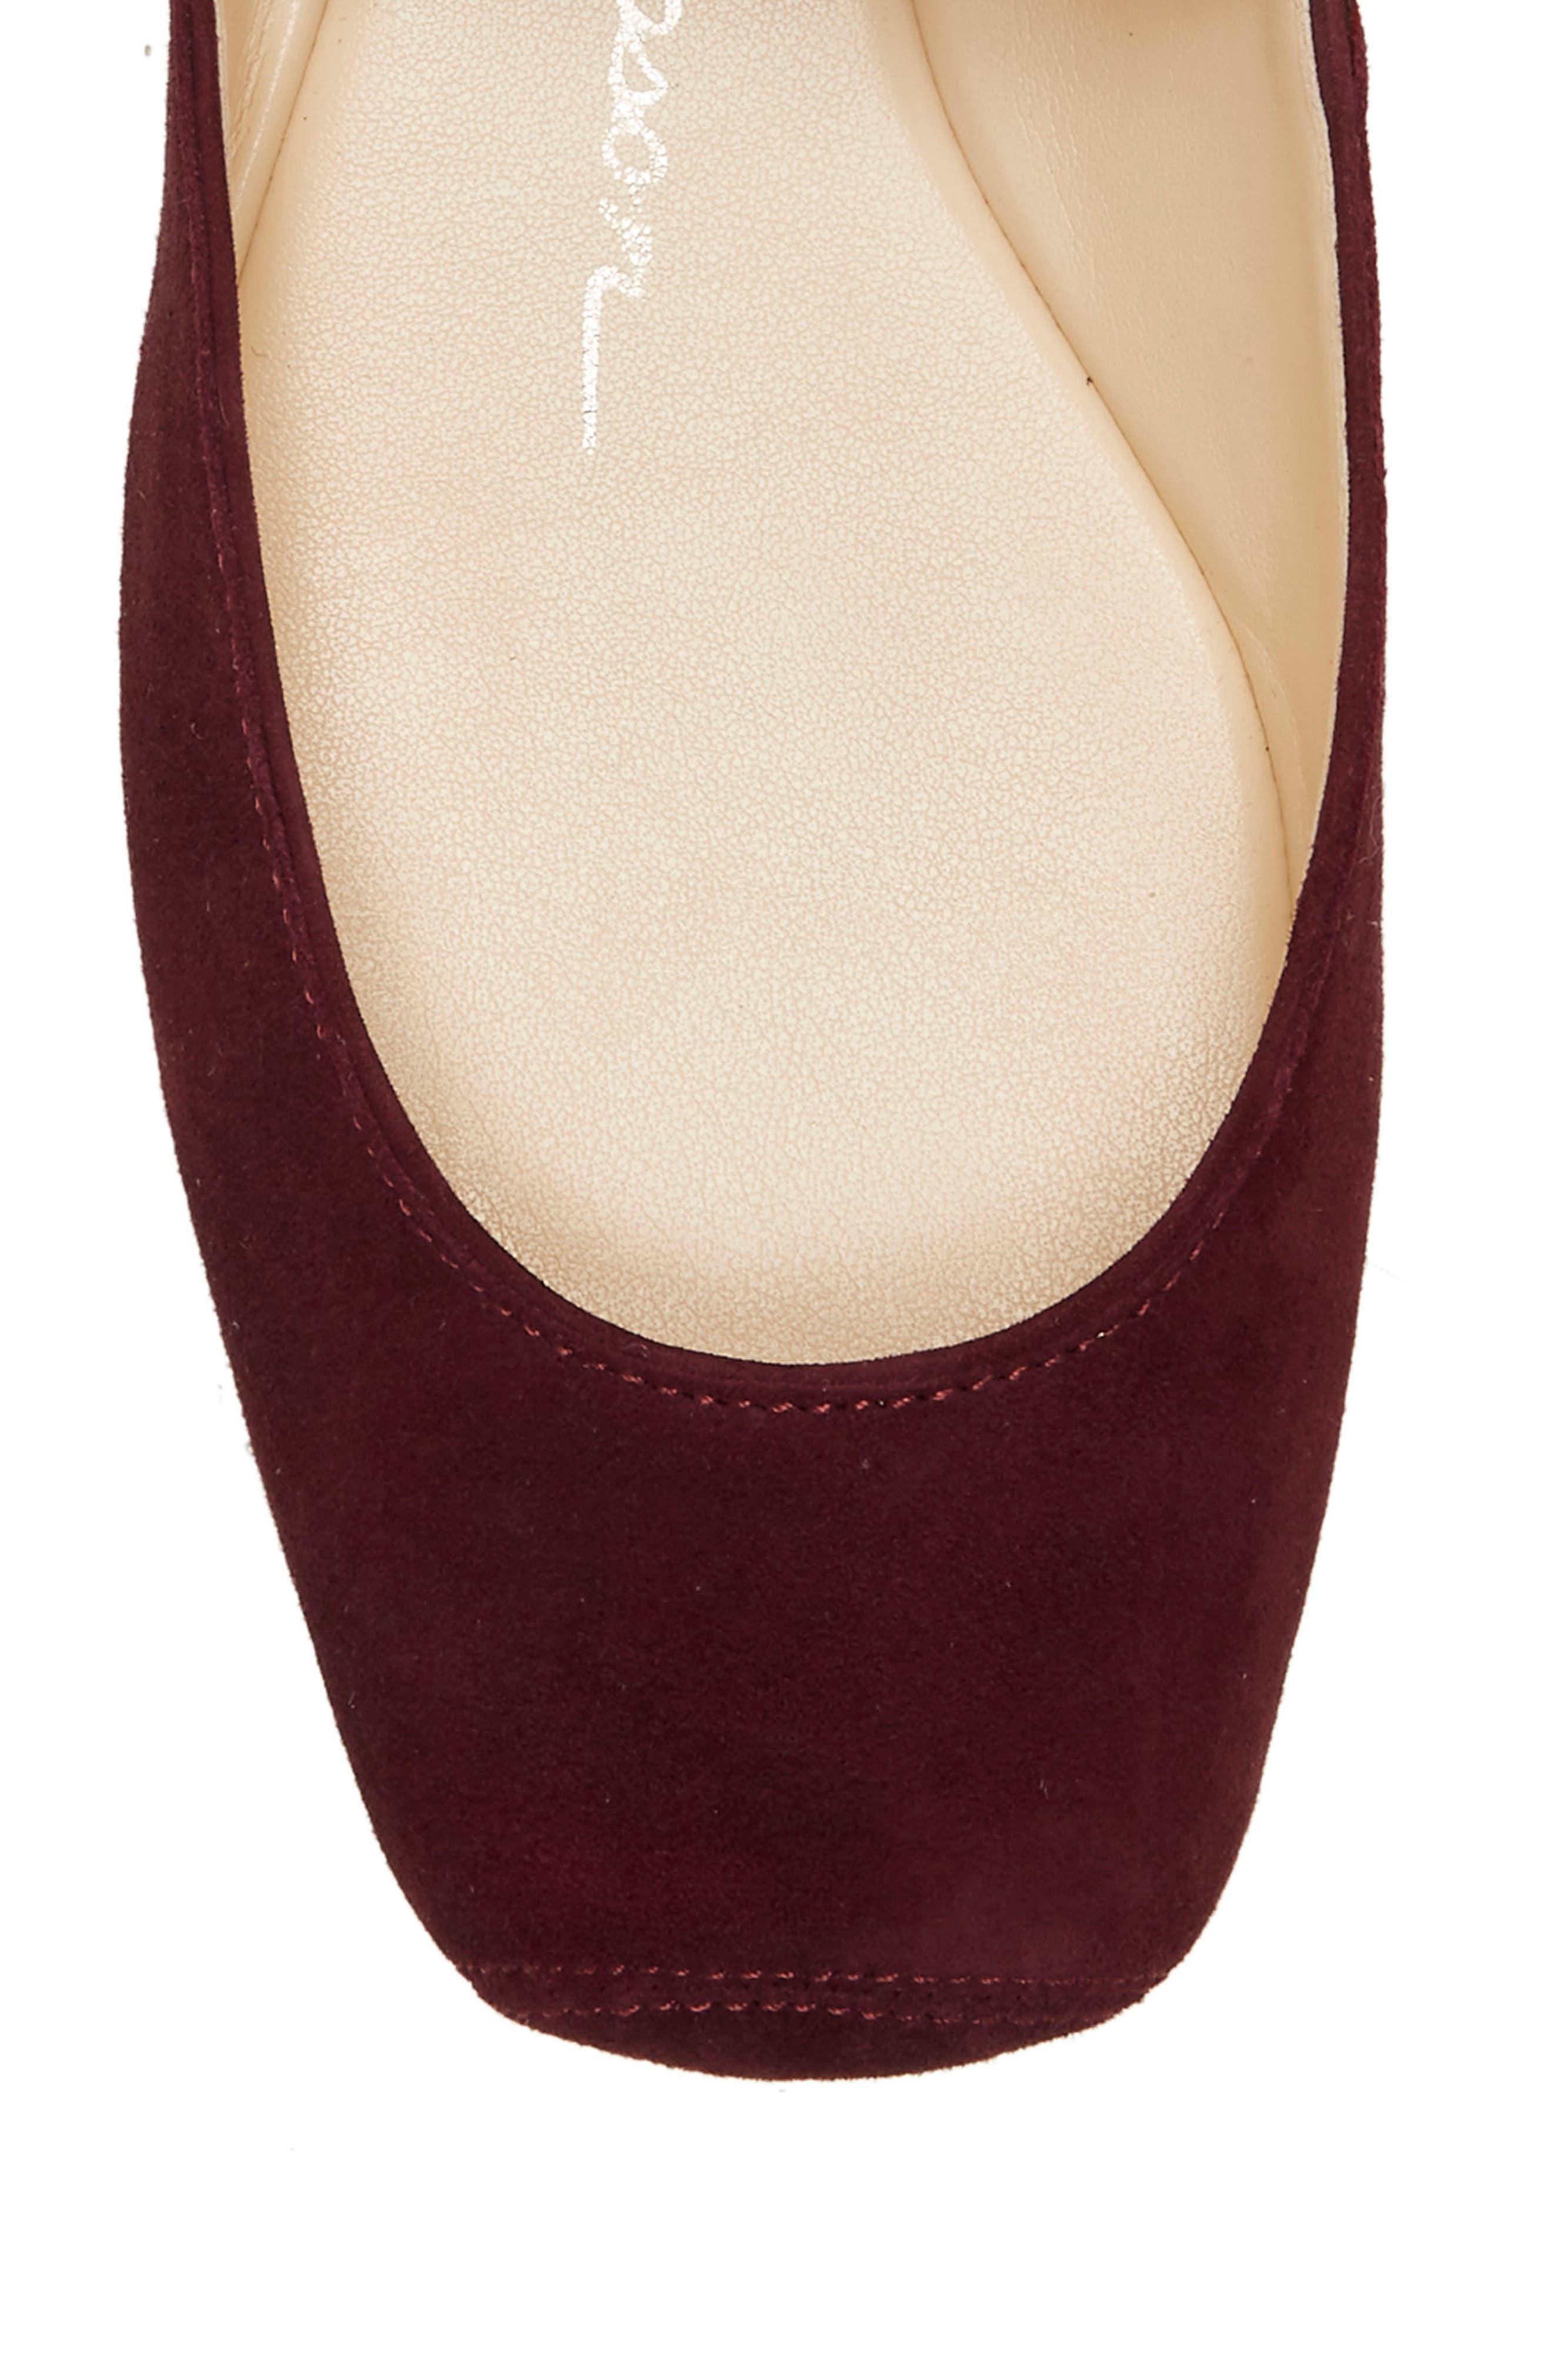 JESSICA SIMPSON, 'Mandalaye' Leather Flat, Alternate thumbnail 8, color, 501